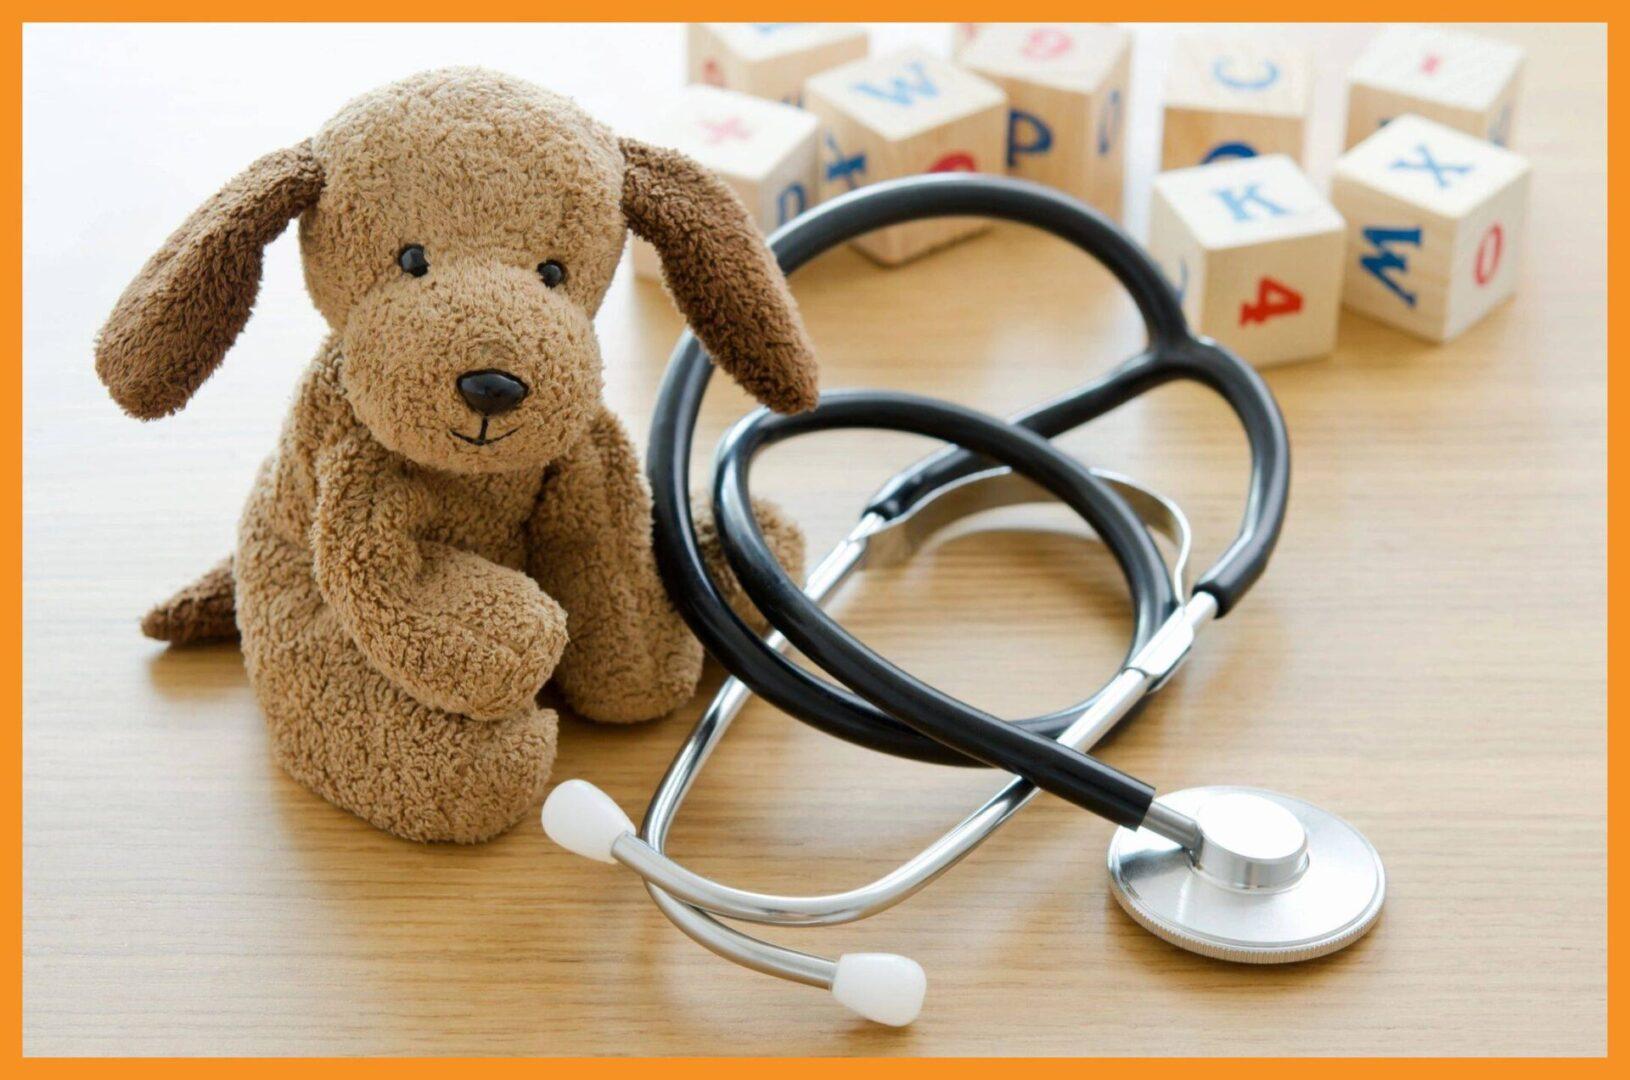 Richardson Pediatrics